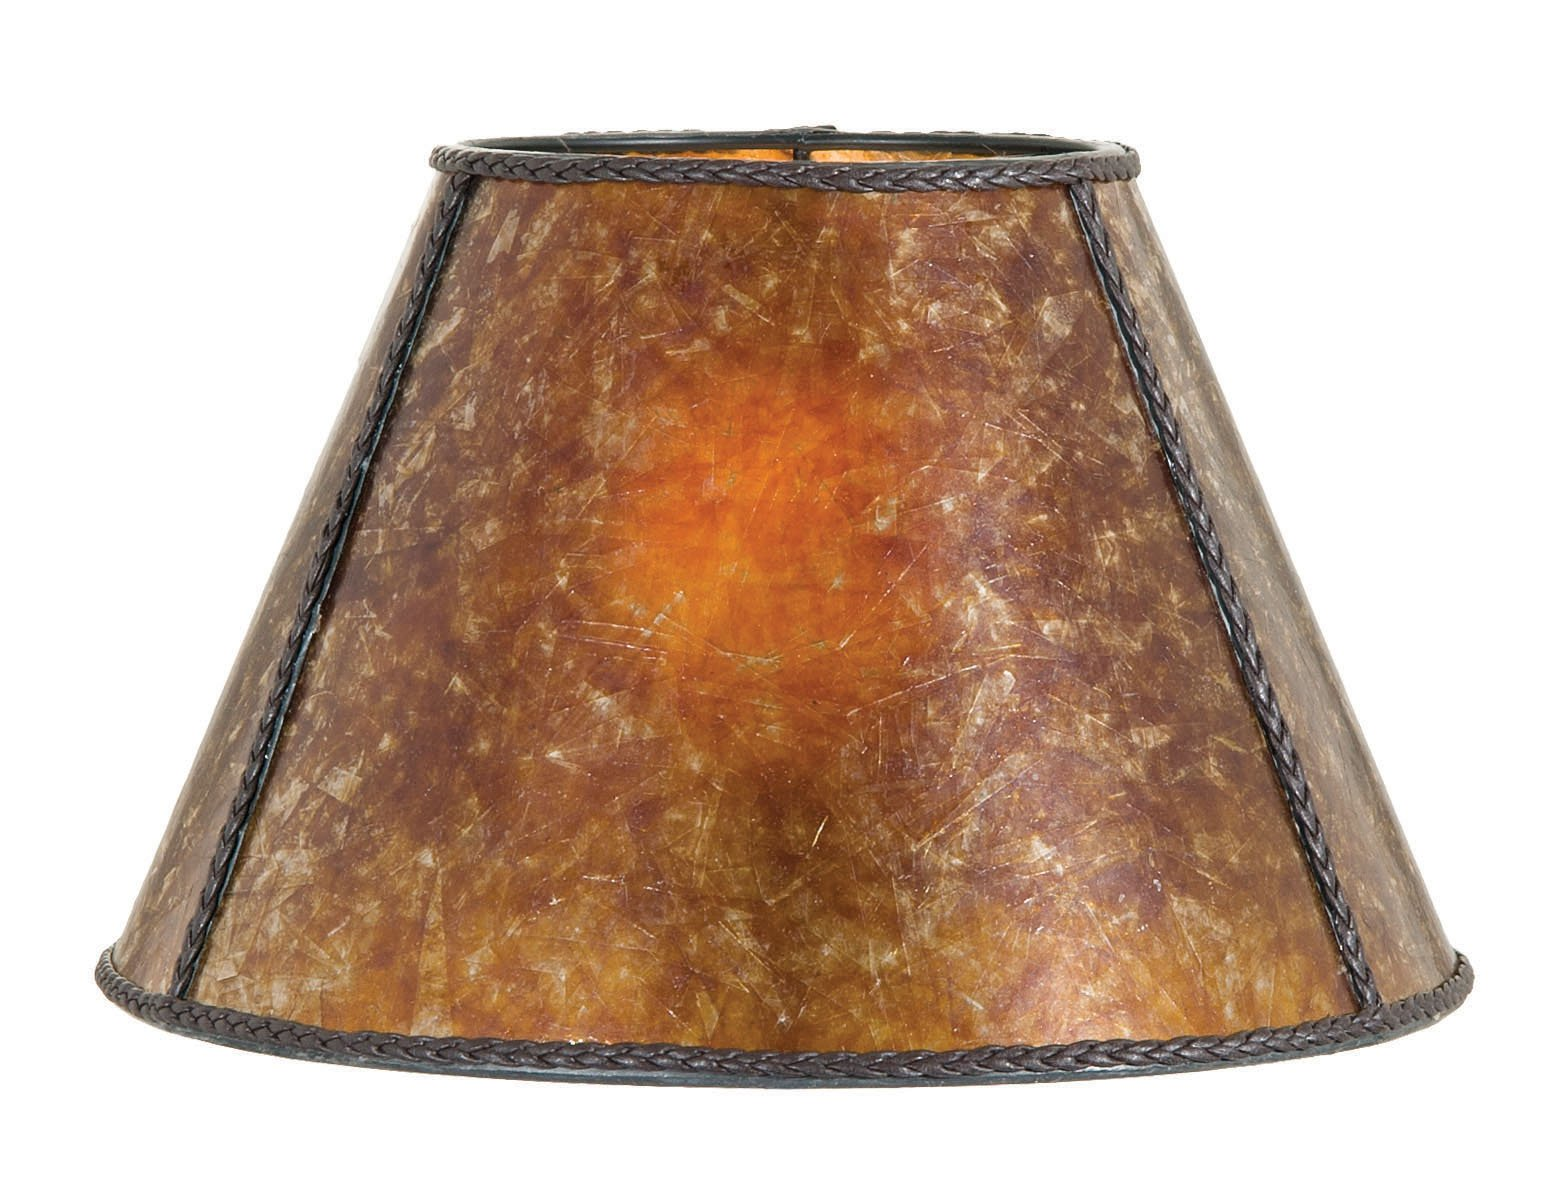 B&P Lamp Antique Amber, 6 12 7.5, Uno, Flush, (5) by B&P Lamp